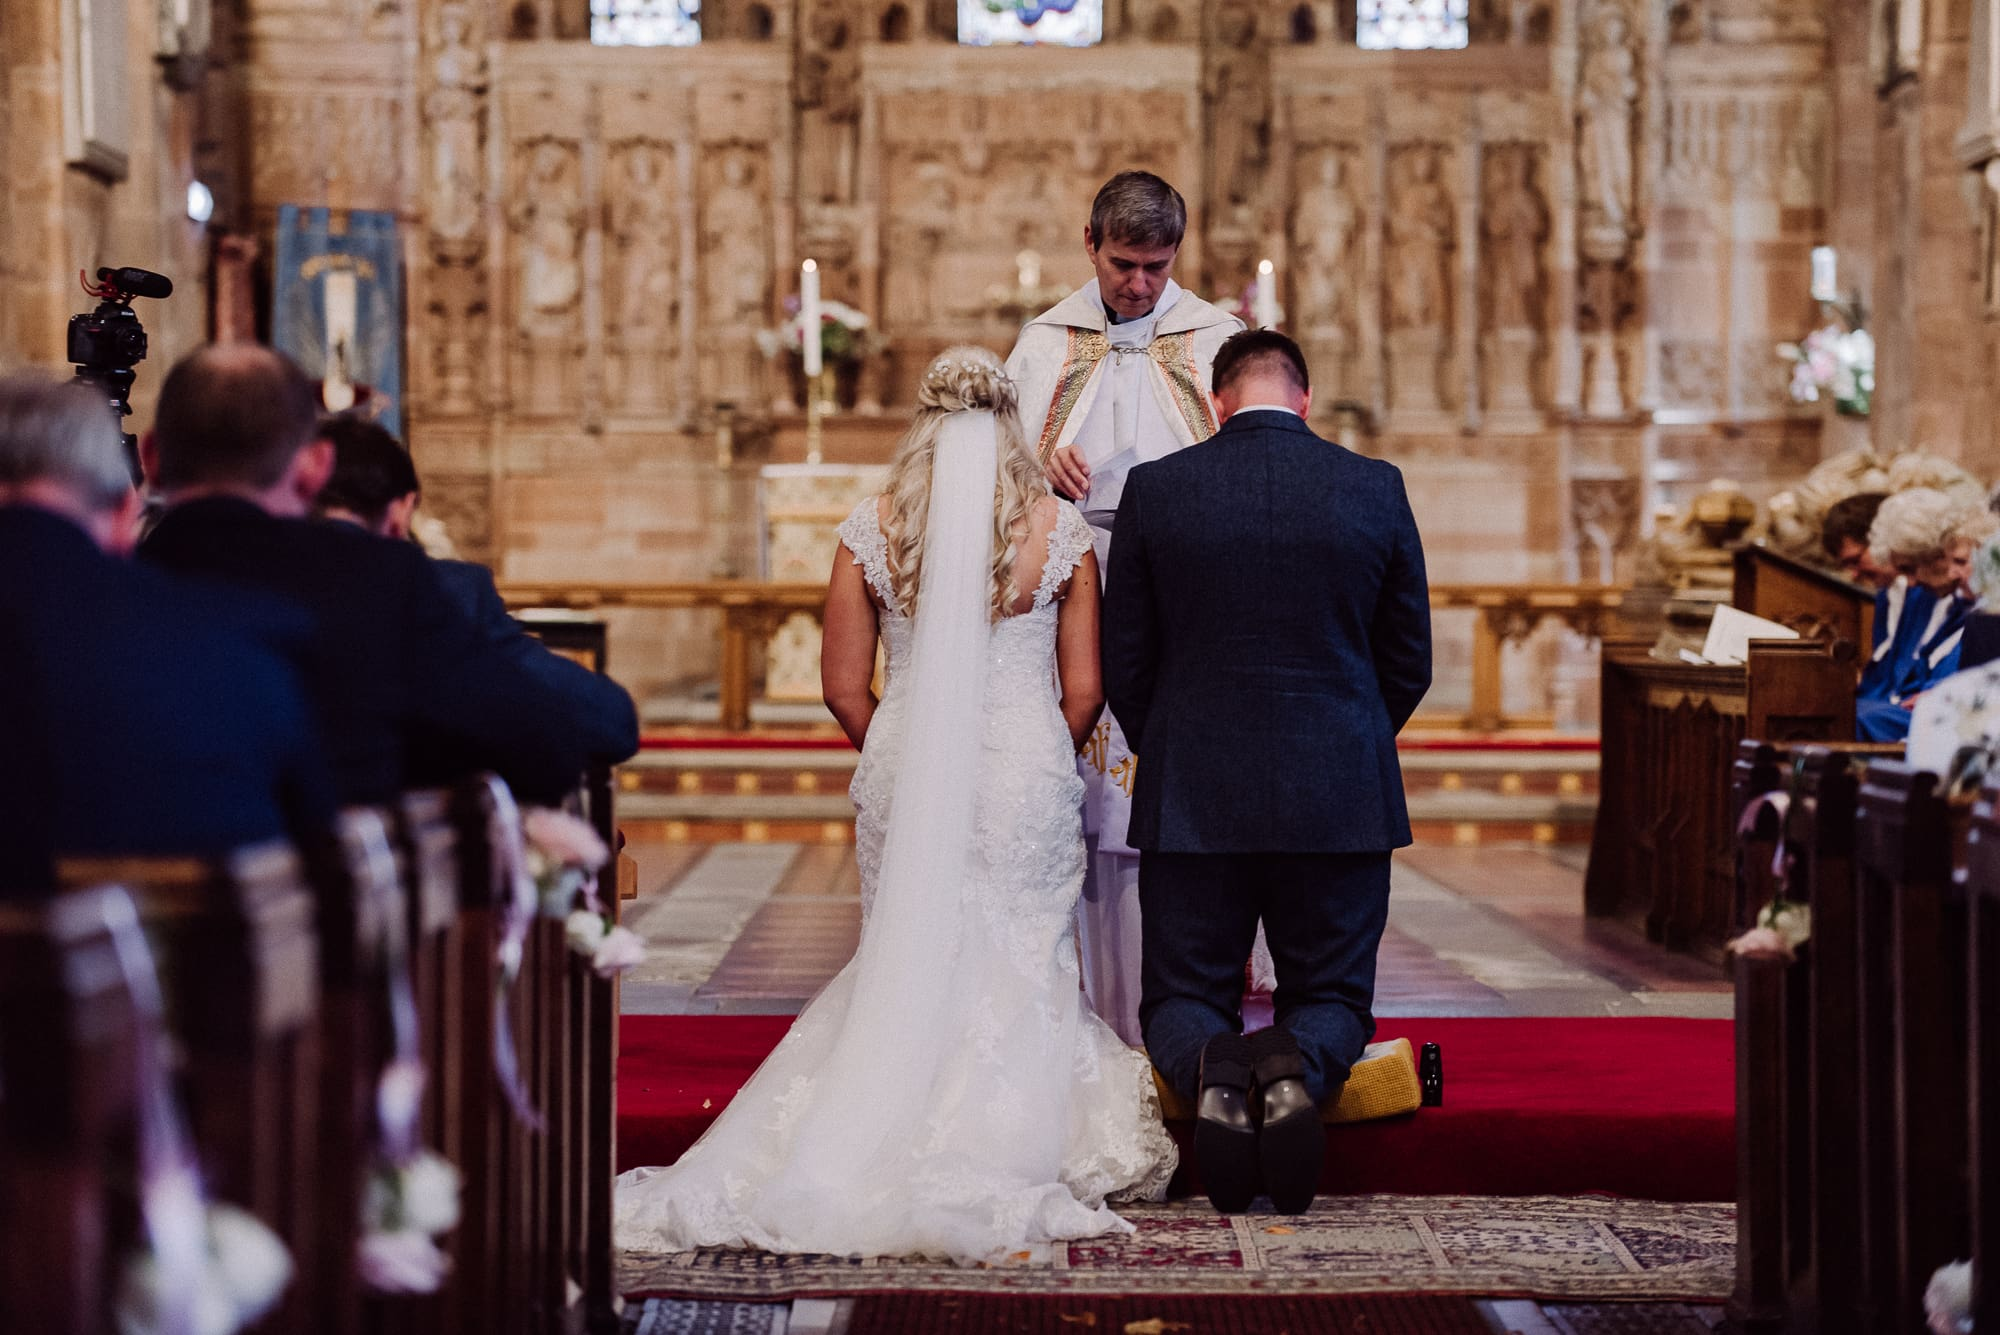 Church Wedding Prayers Somerford Hall Tianna J-Williams Photography